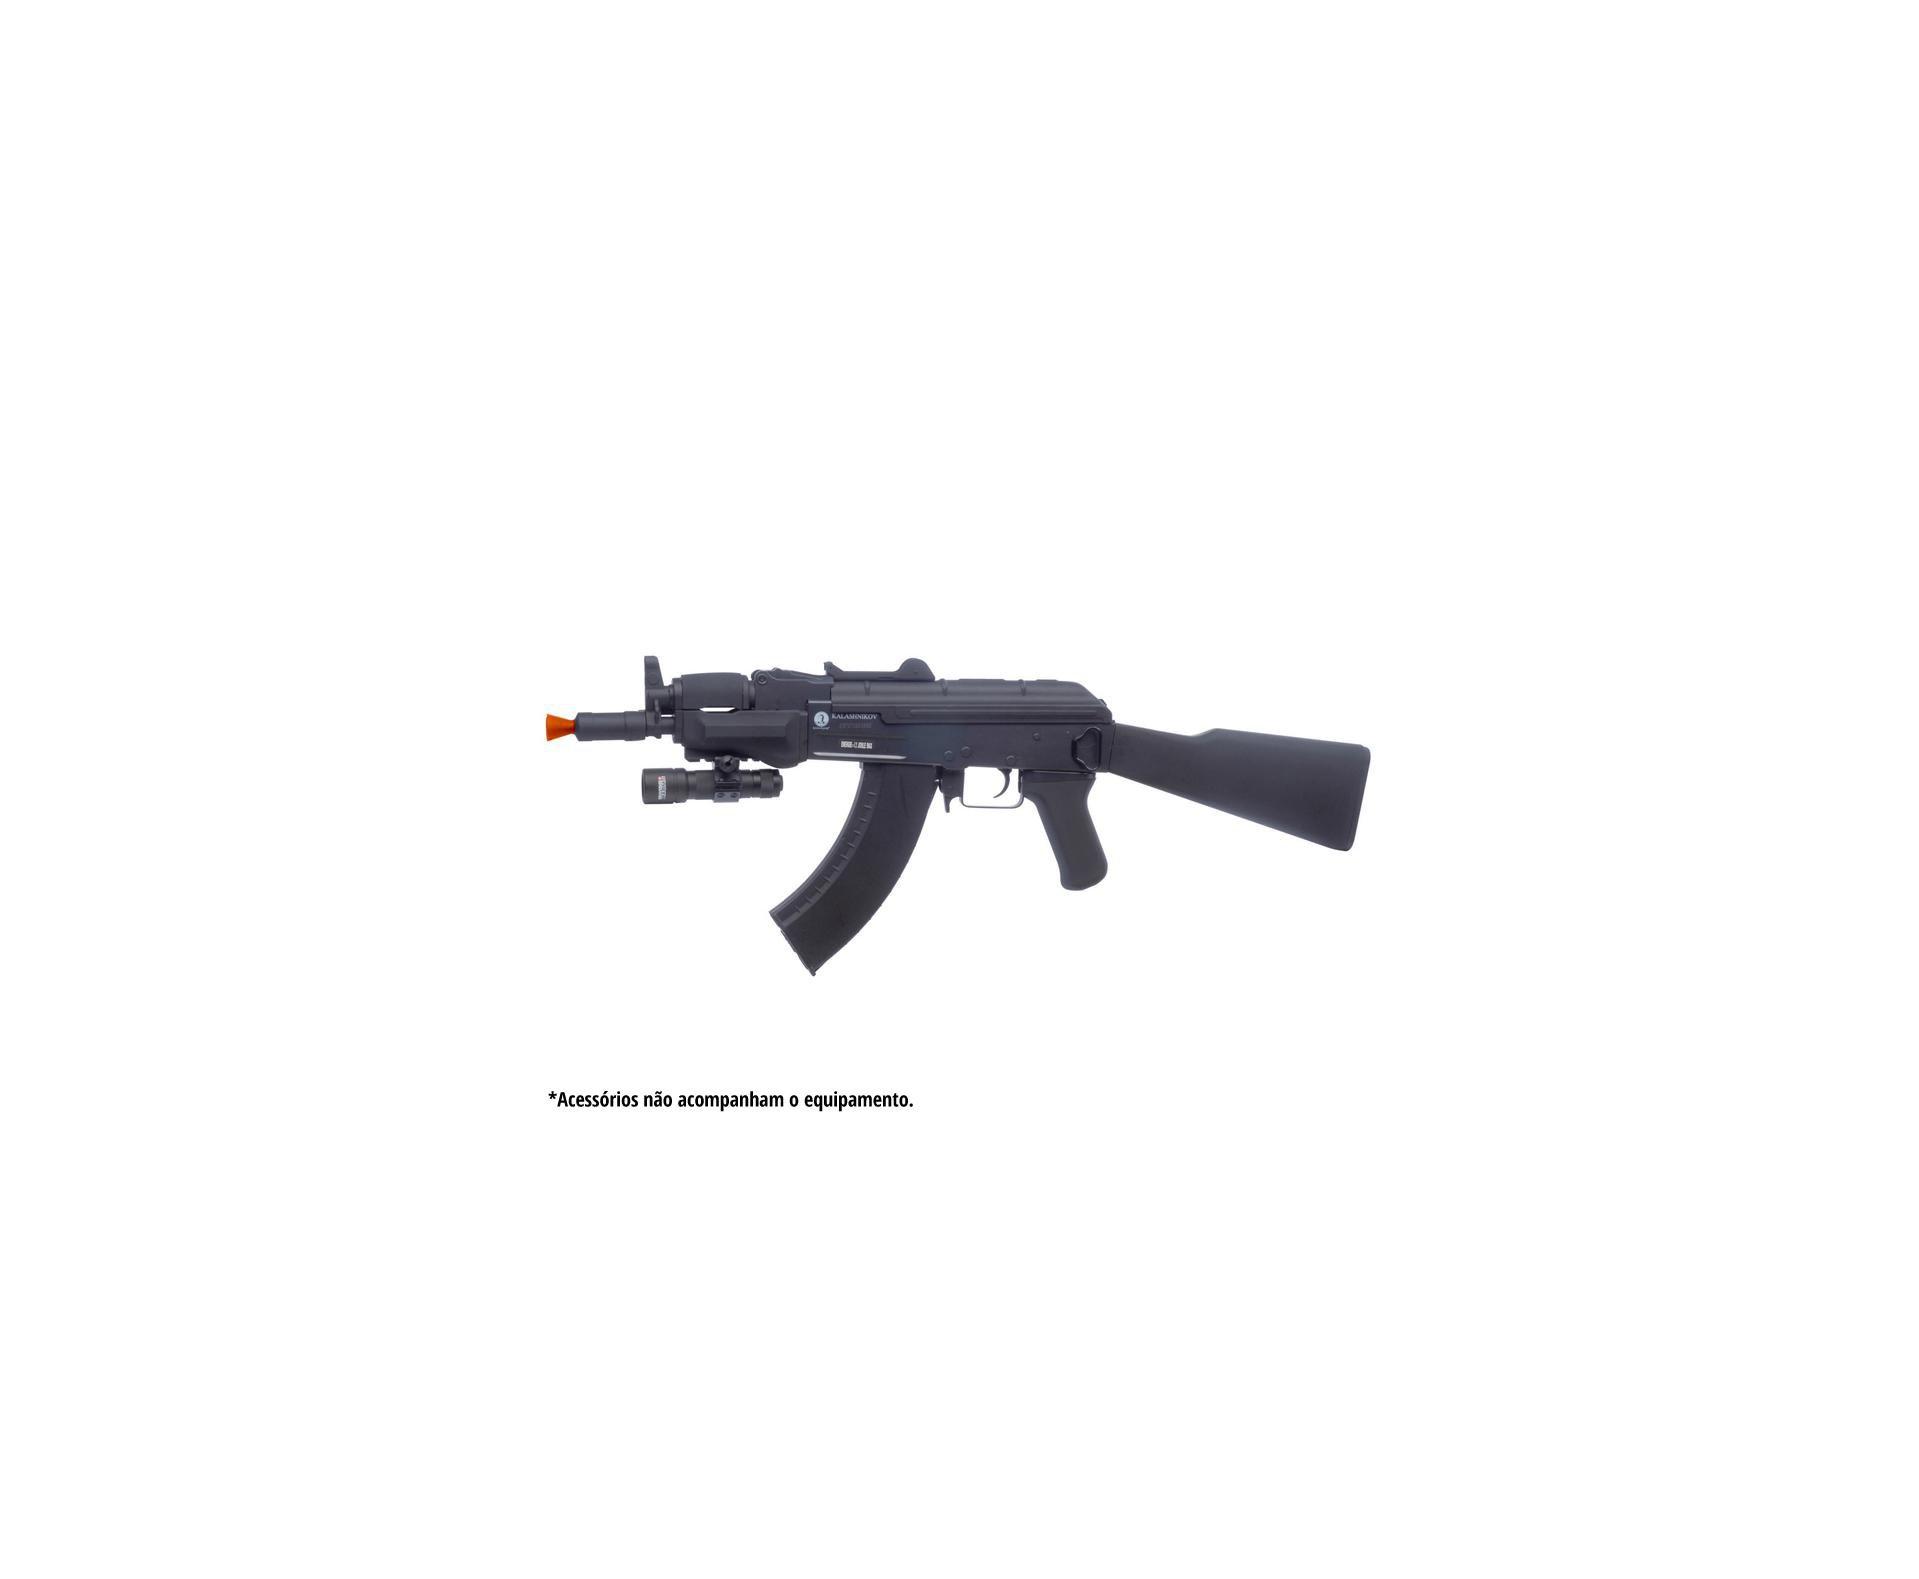 Rifle De Airsoft Spetsnaz Full Metal + Bota Tatica Cano Alto Preta  42 + Esfera 0,20g Bb King